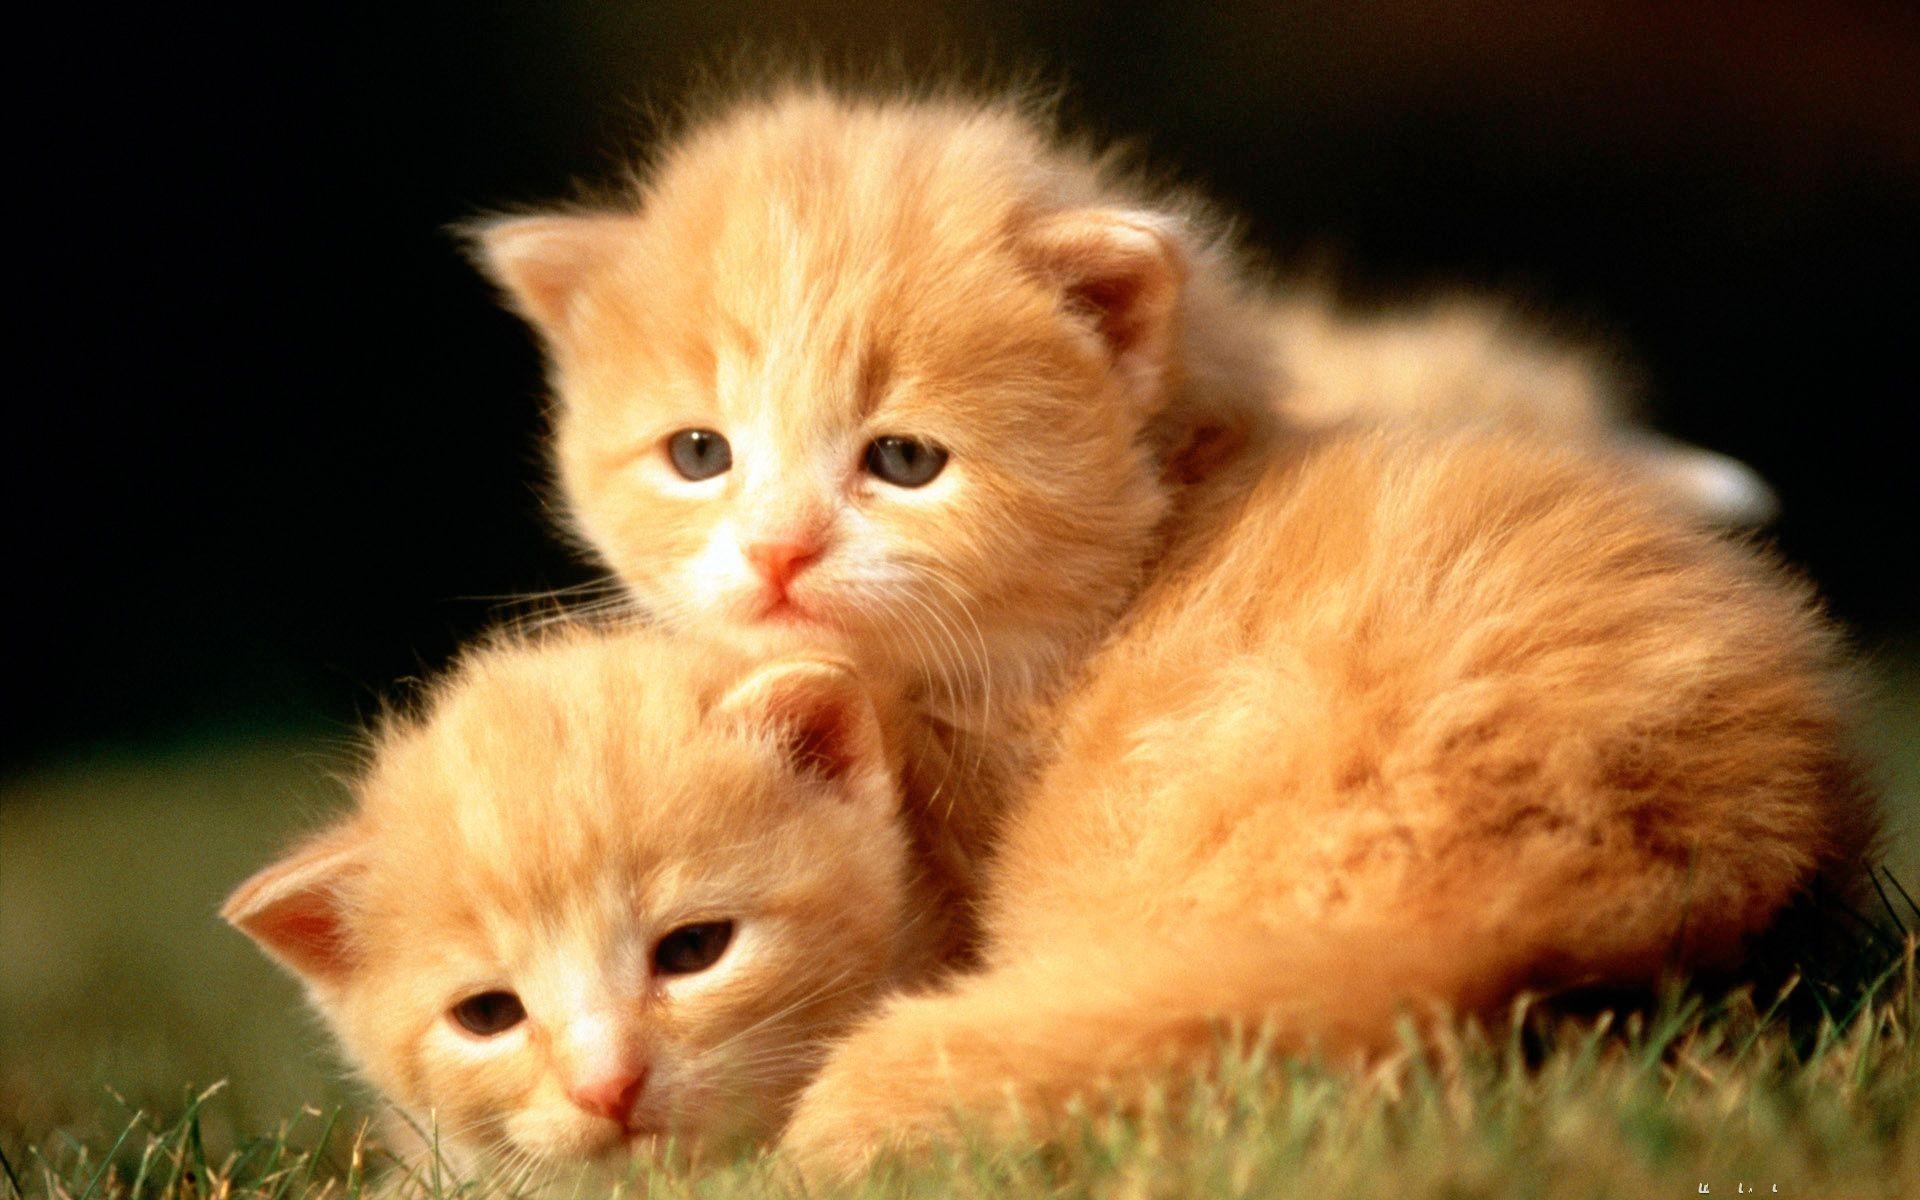 … Cute Baby Animal Cats Desktop Pics. Download